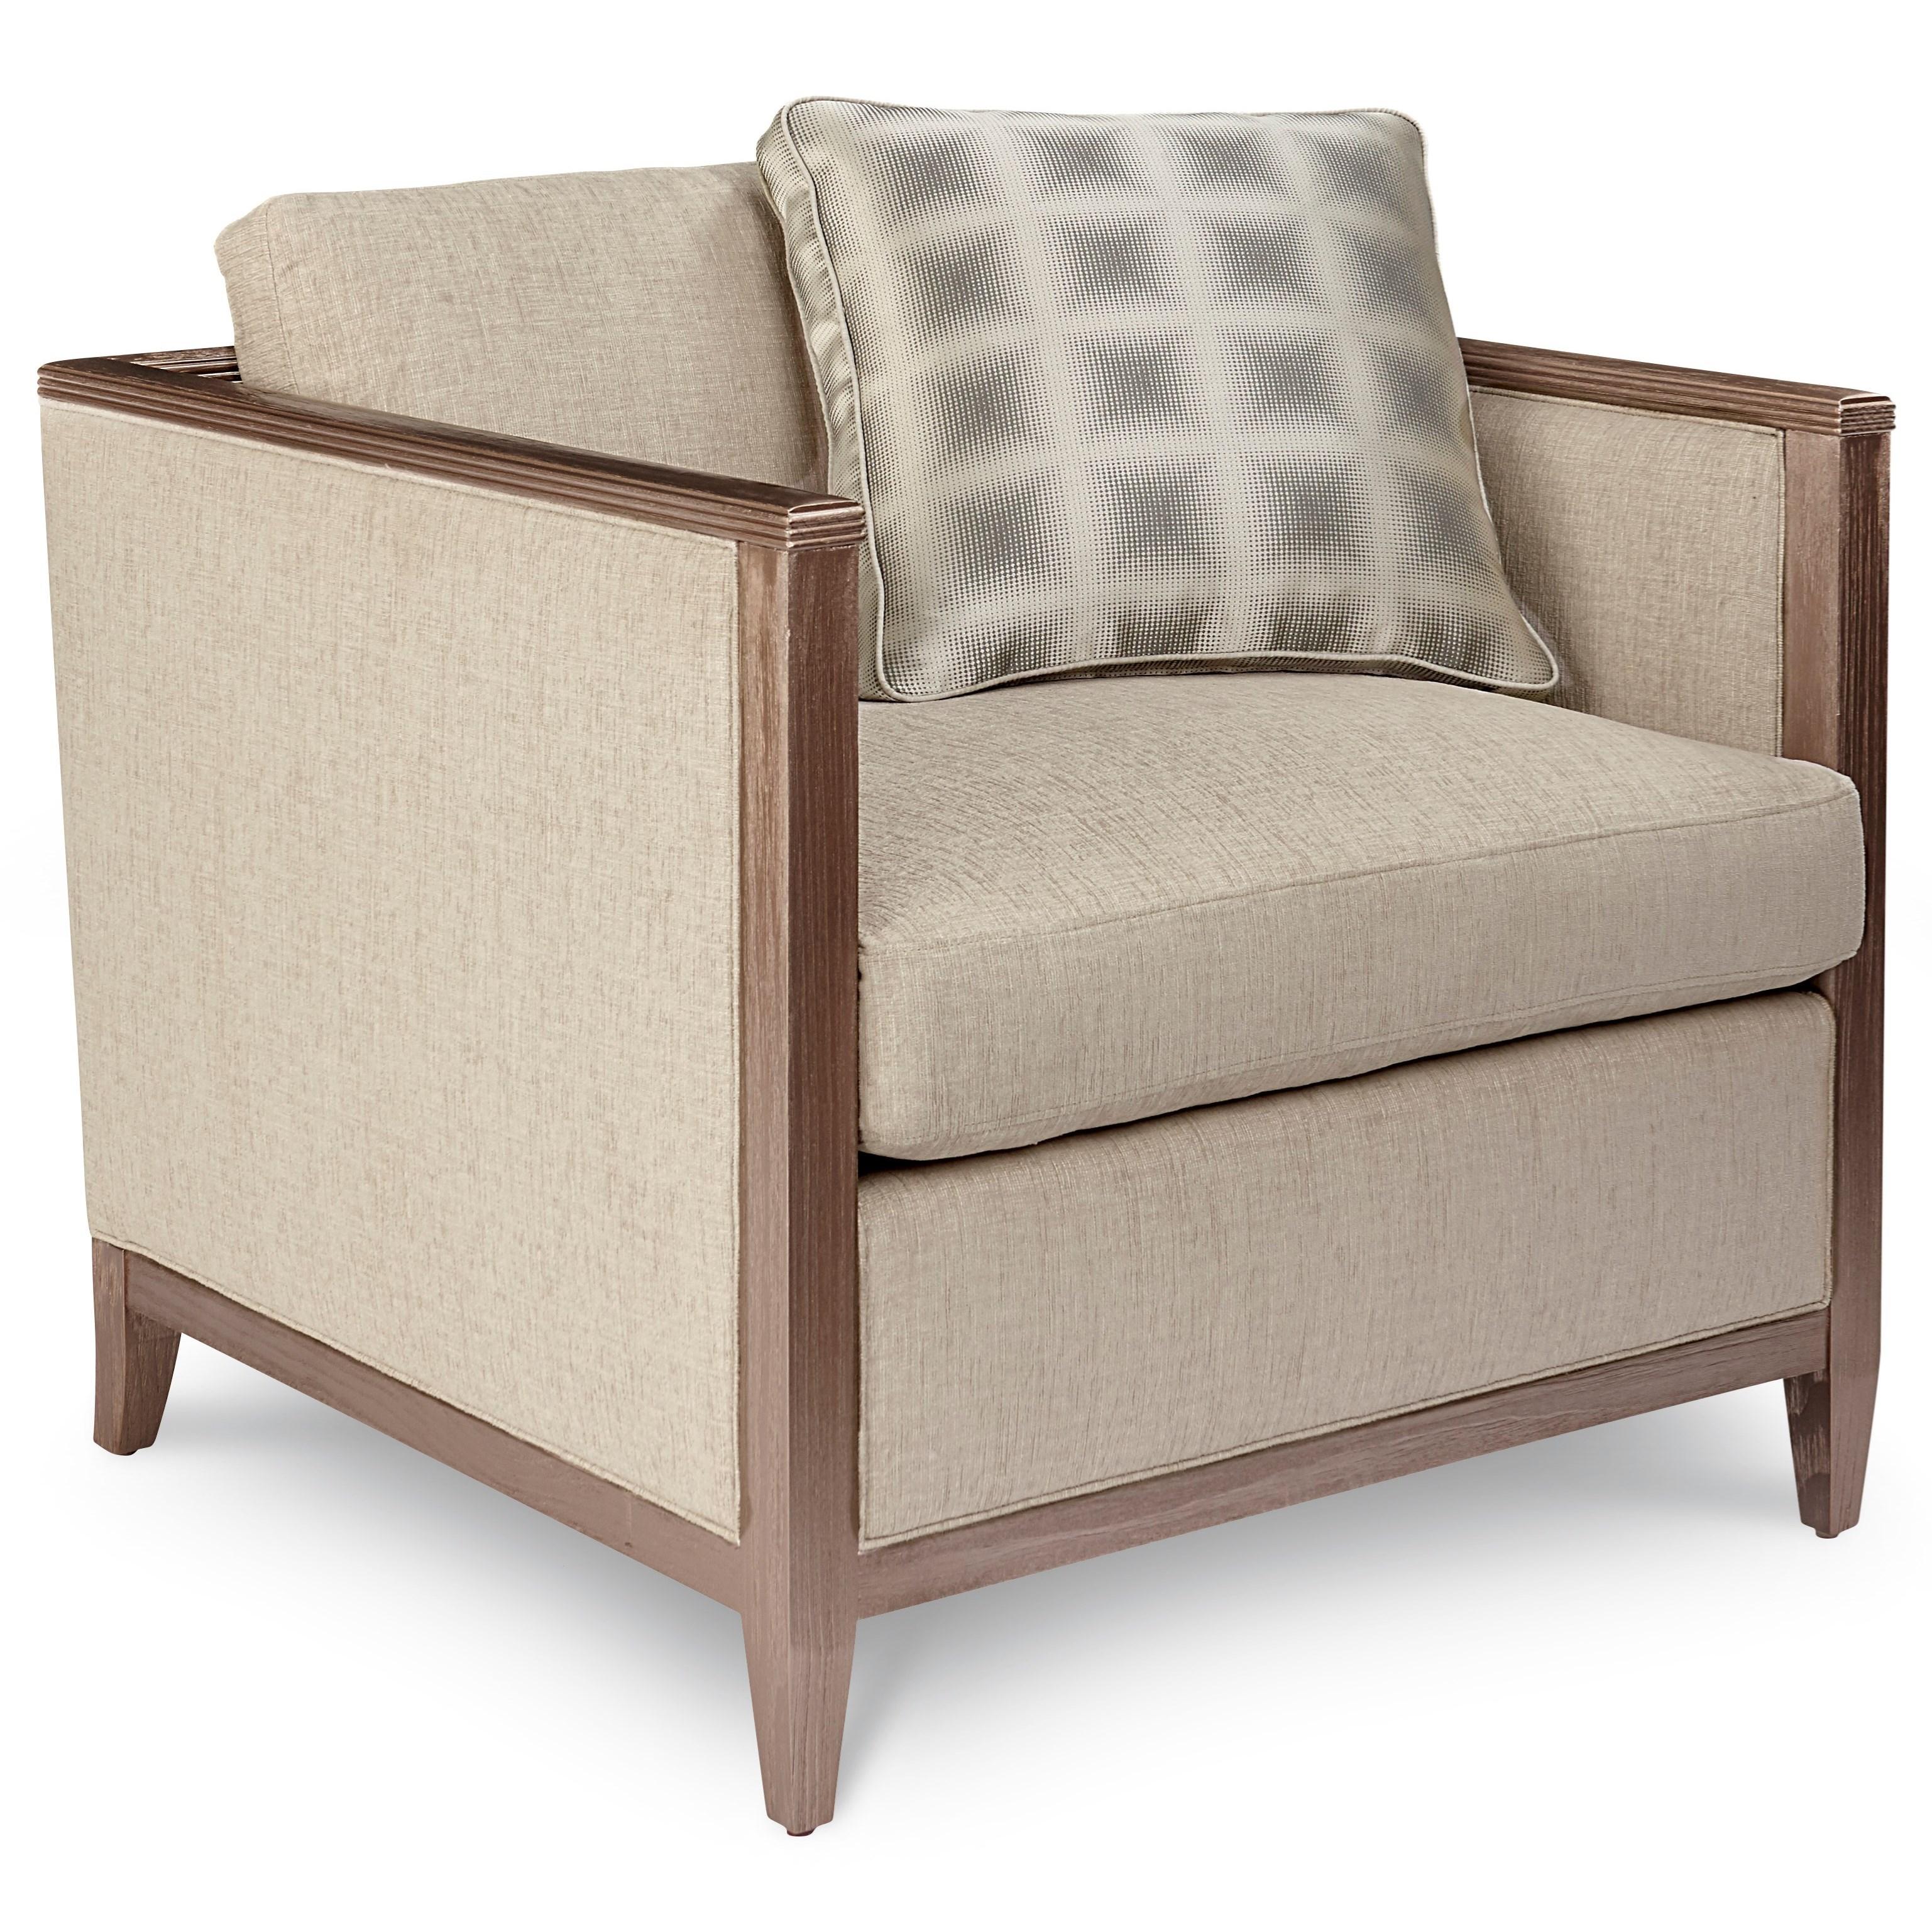 Astor Chair